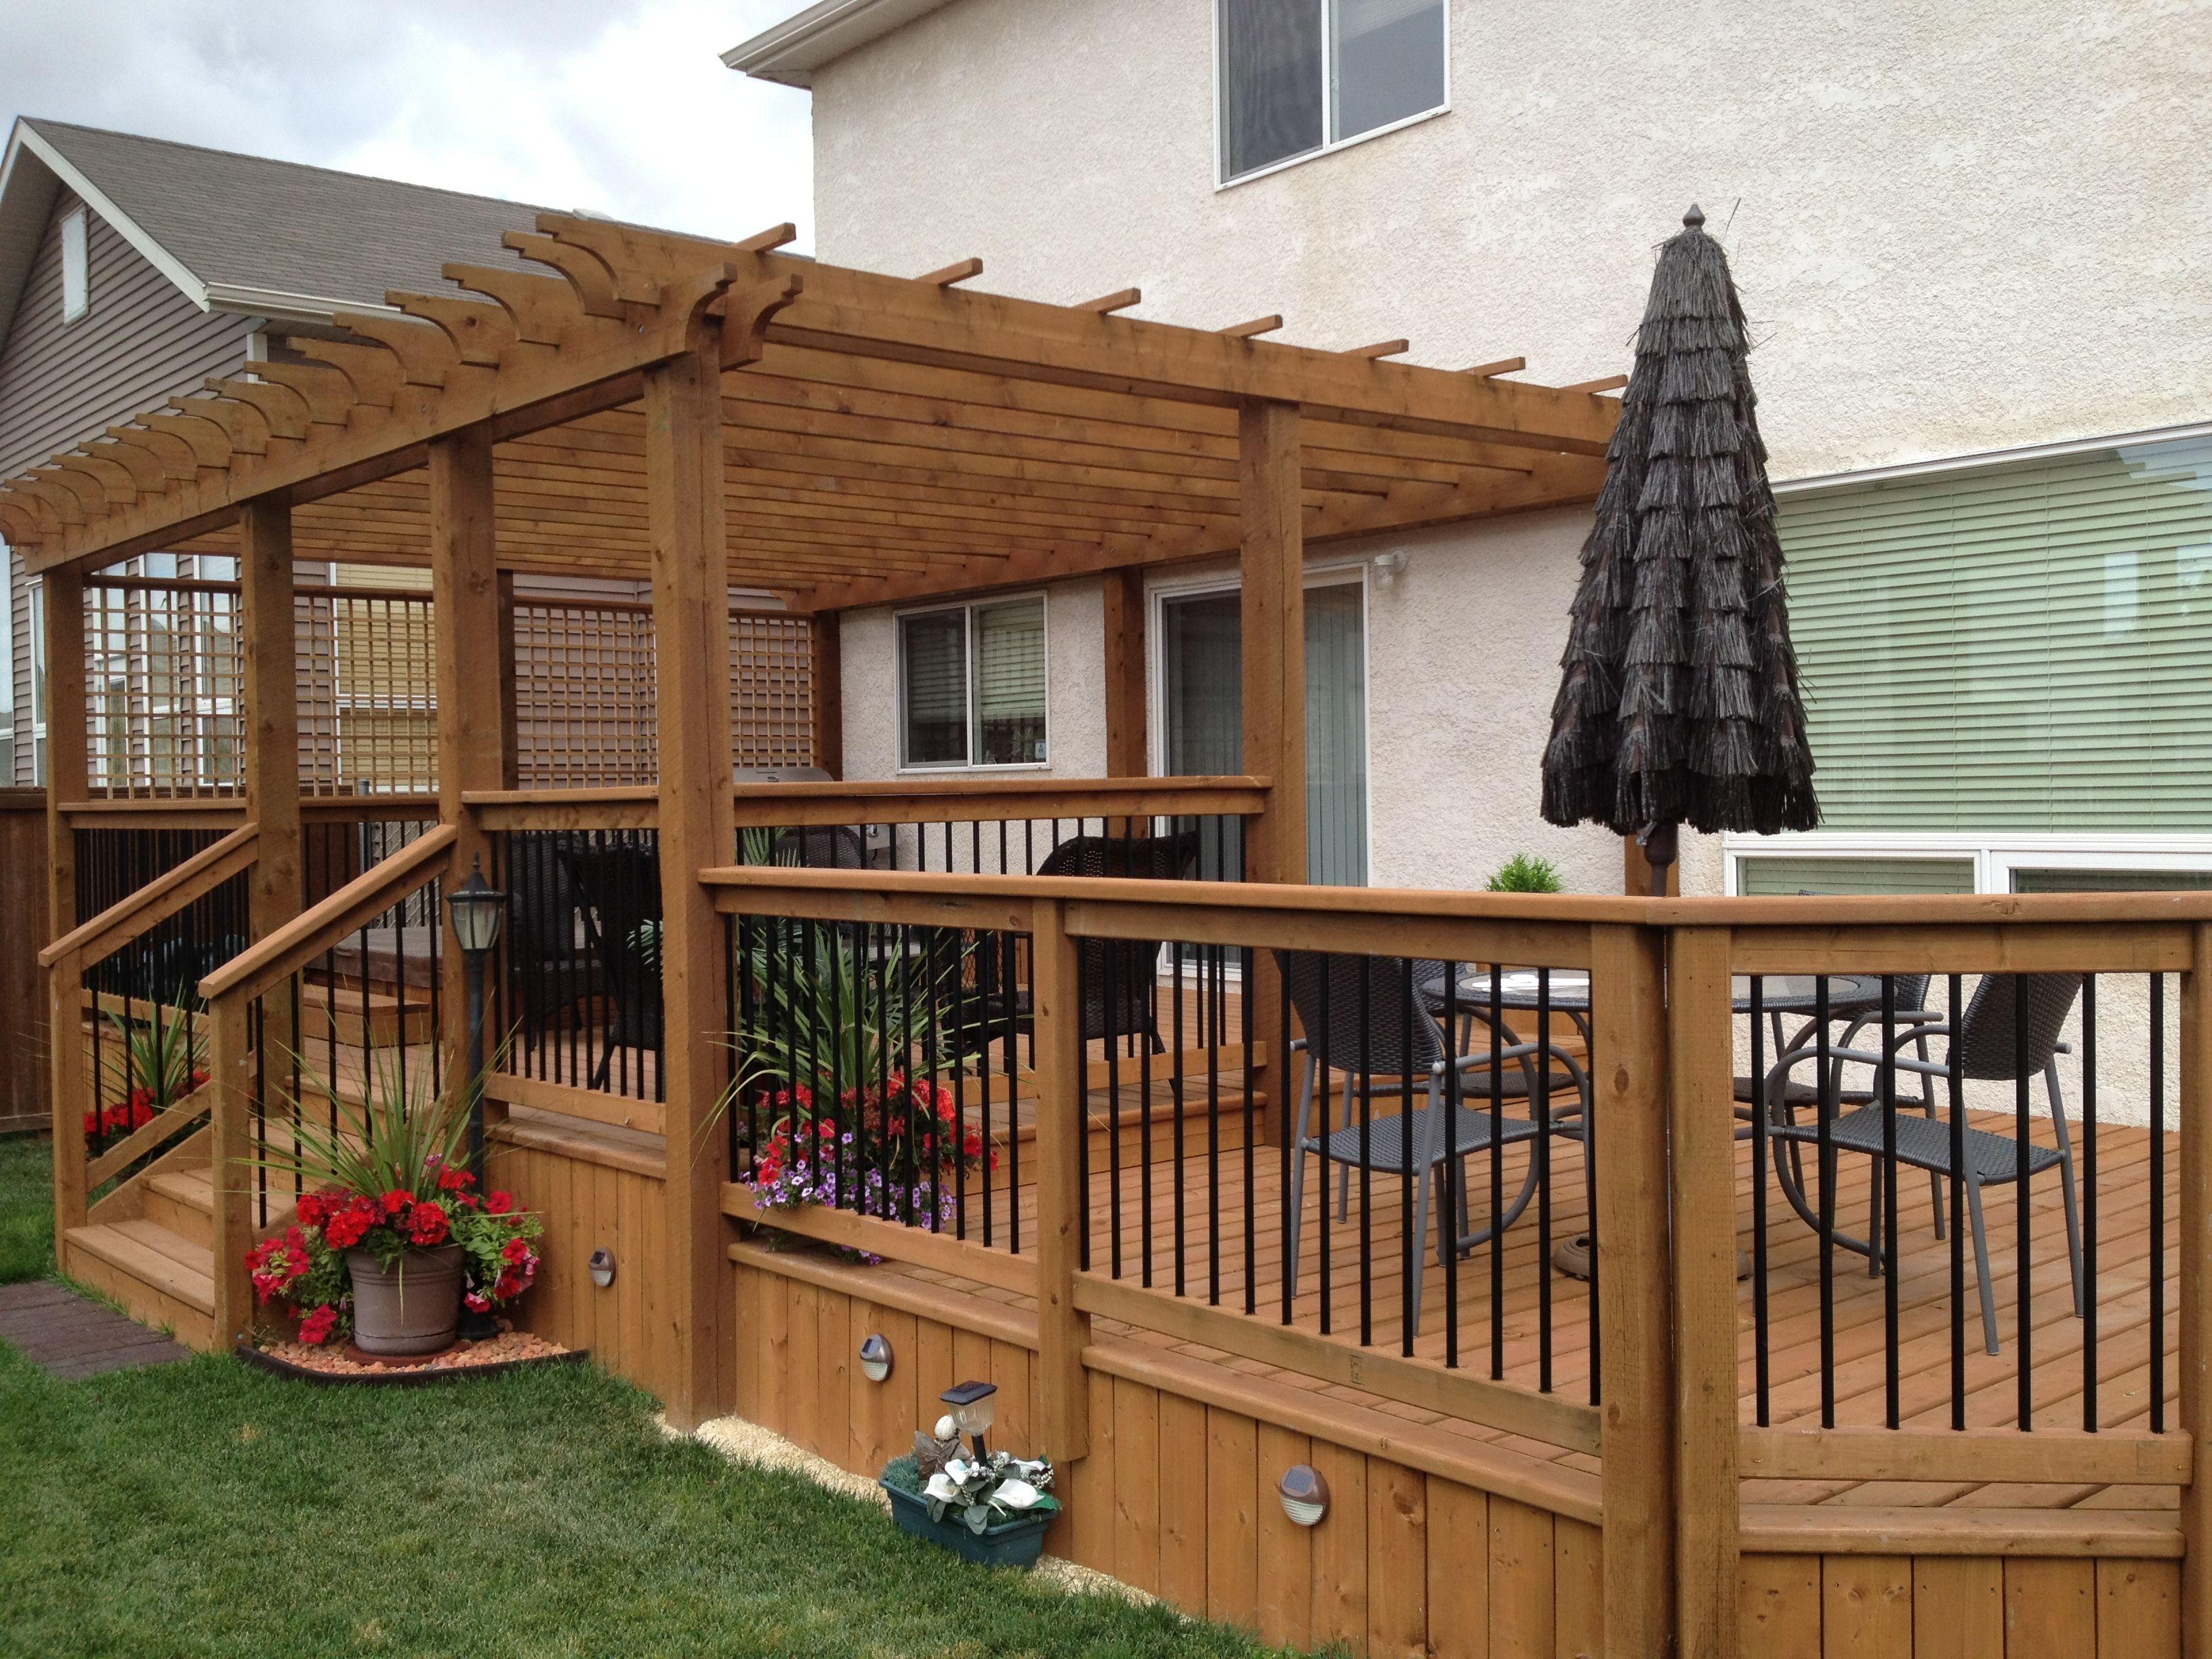 Multi Level Decks Design And Ideas Patio Deck Designs Decks Backyard Deck With Pergola